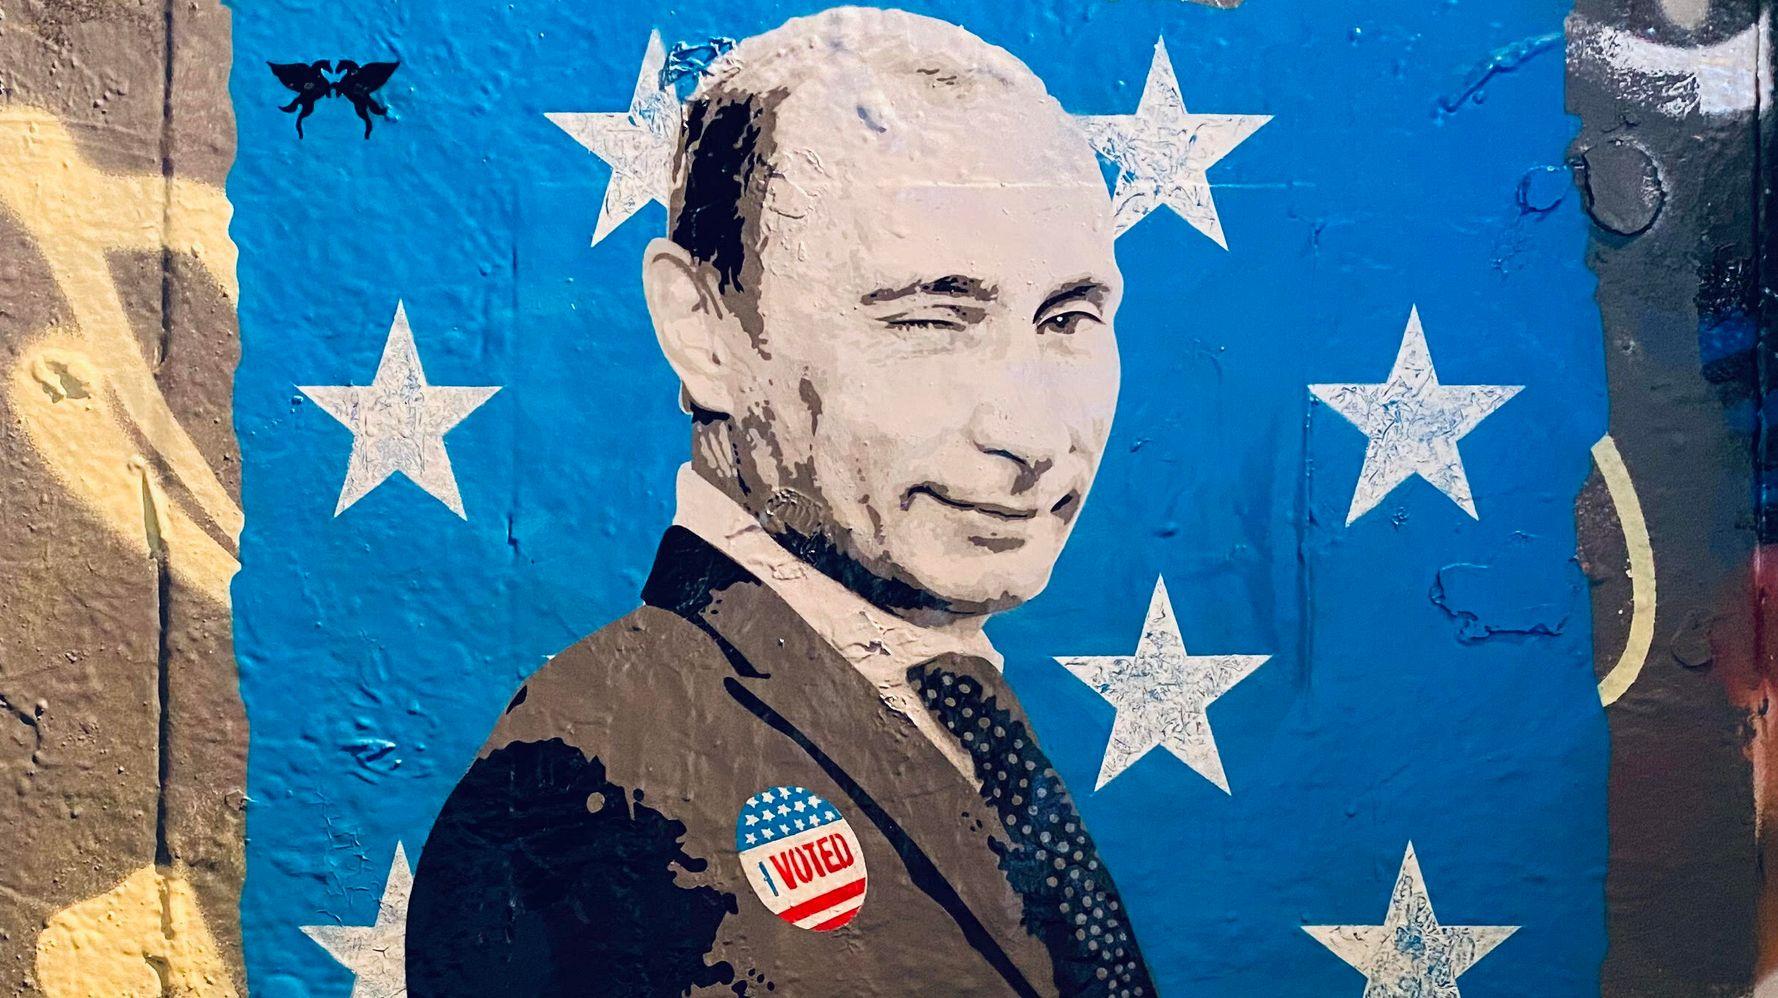 Winking Vladimir Putin Gets 'I Voted' Sticker In Election Day Street Art